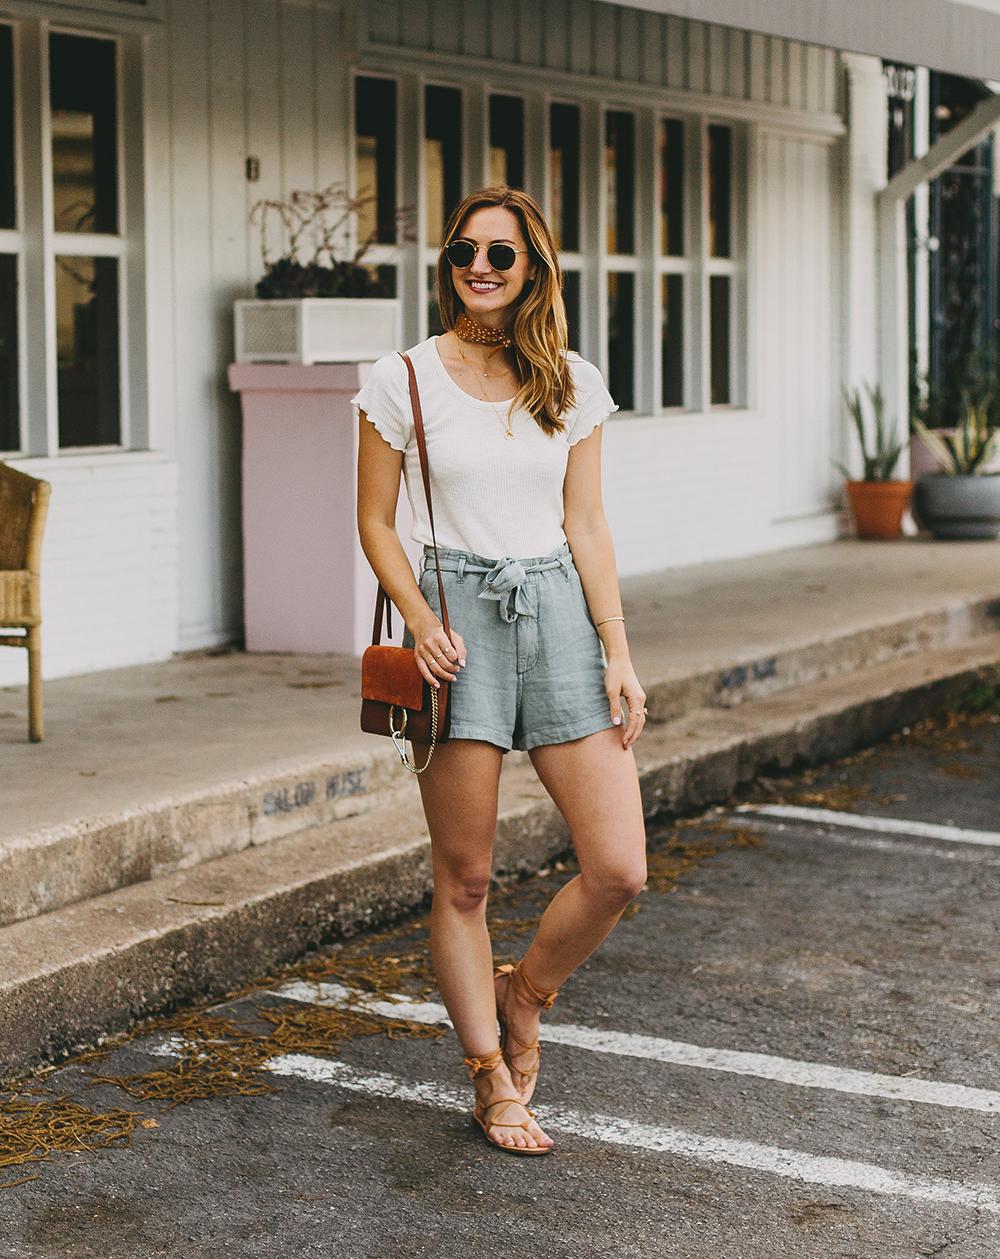 livvyland-blog-olivia-watson-austin-texas-style-blogger-abercrombie-linen-high-waist-tie-shorts-1